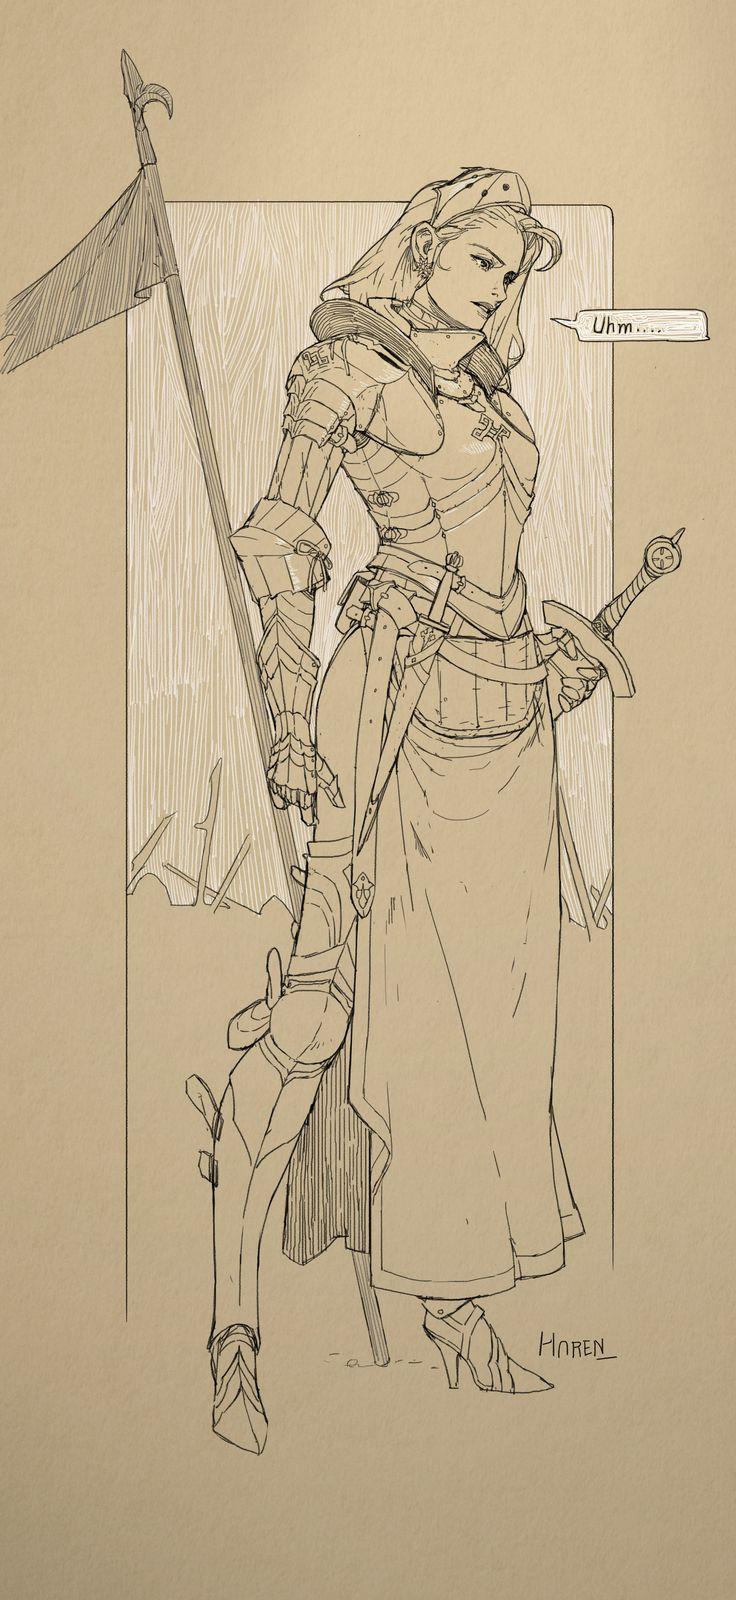 ArtStation - Doodle - Female Medieval Concept Knight - Armor Study, Kim Han seul (aka Haren)